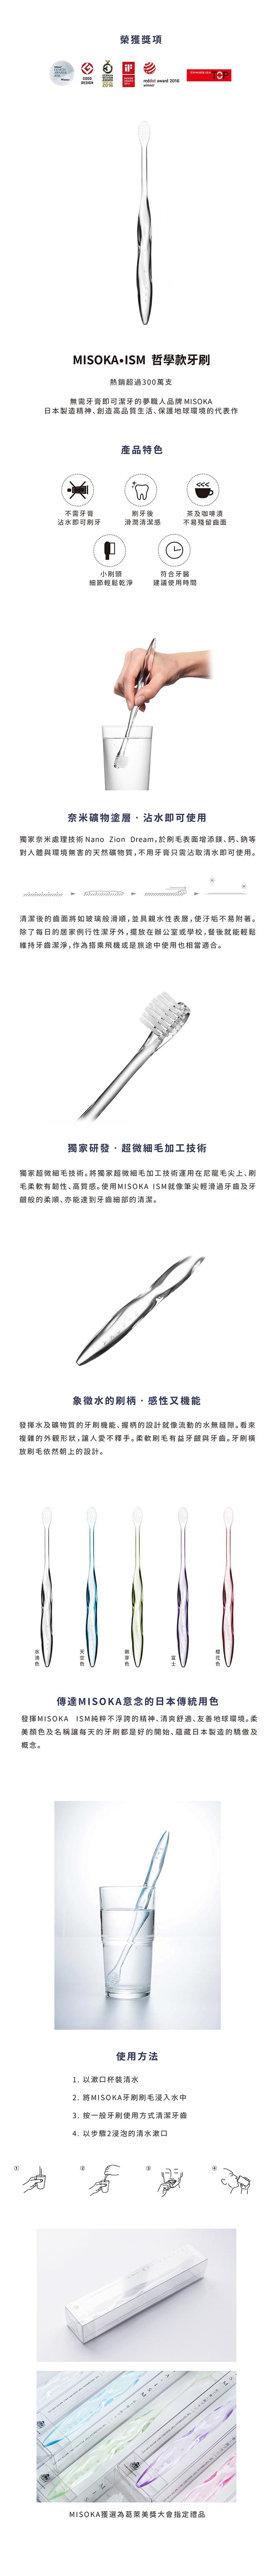 MISOKA │ ISM 免牙膏哲學款牙刷 (日本製 / 櫻花色)